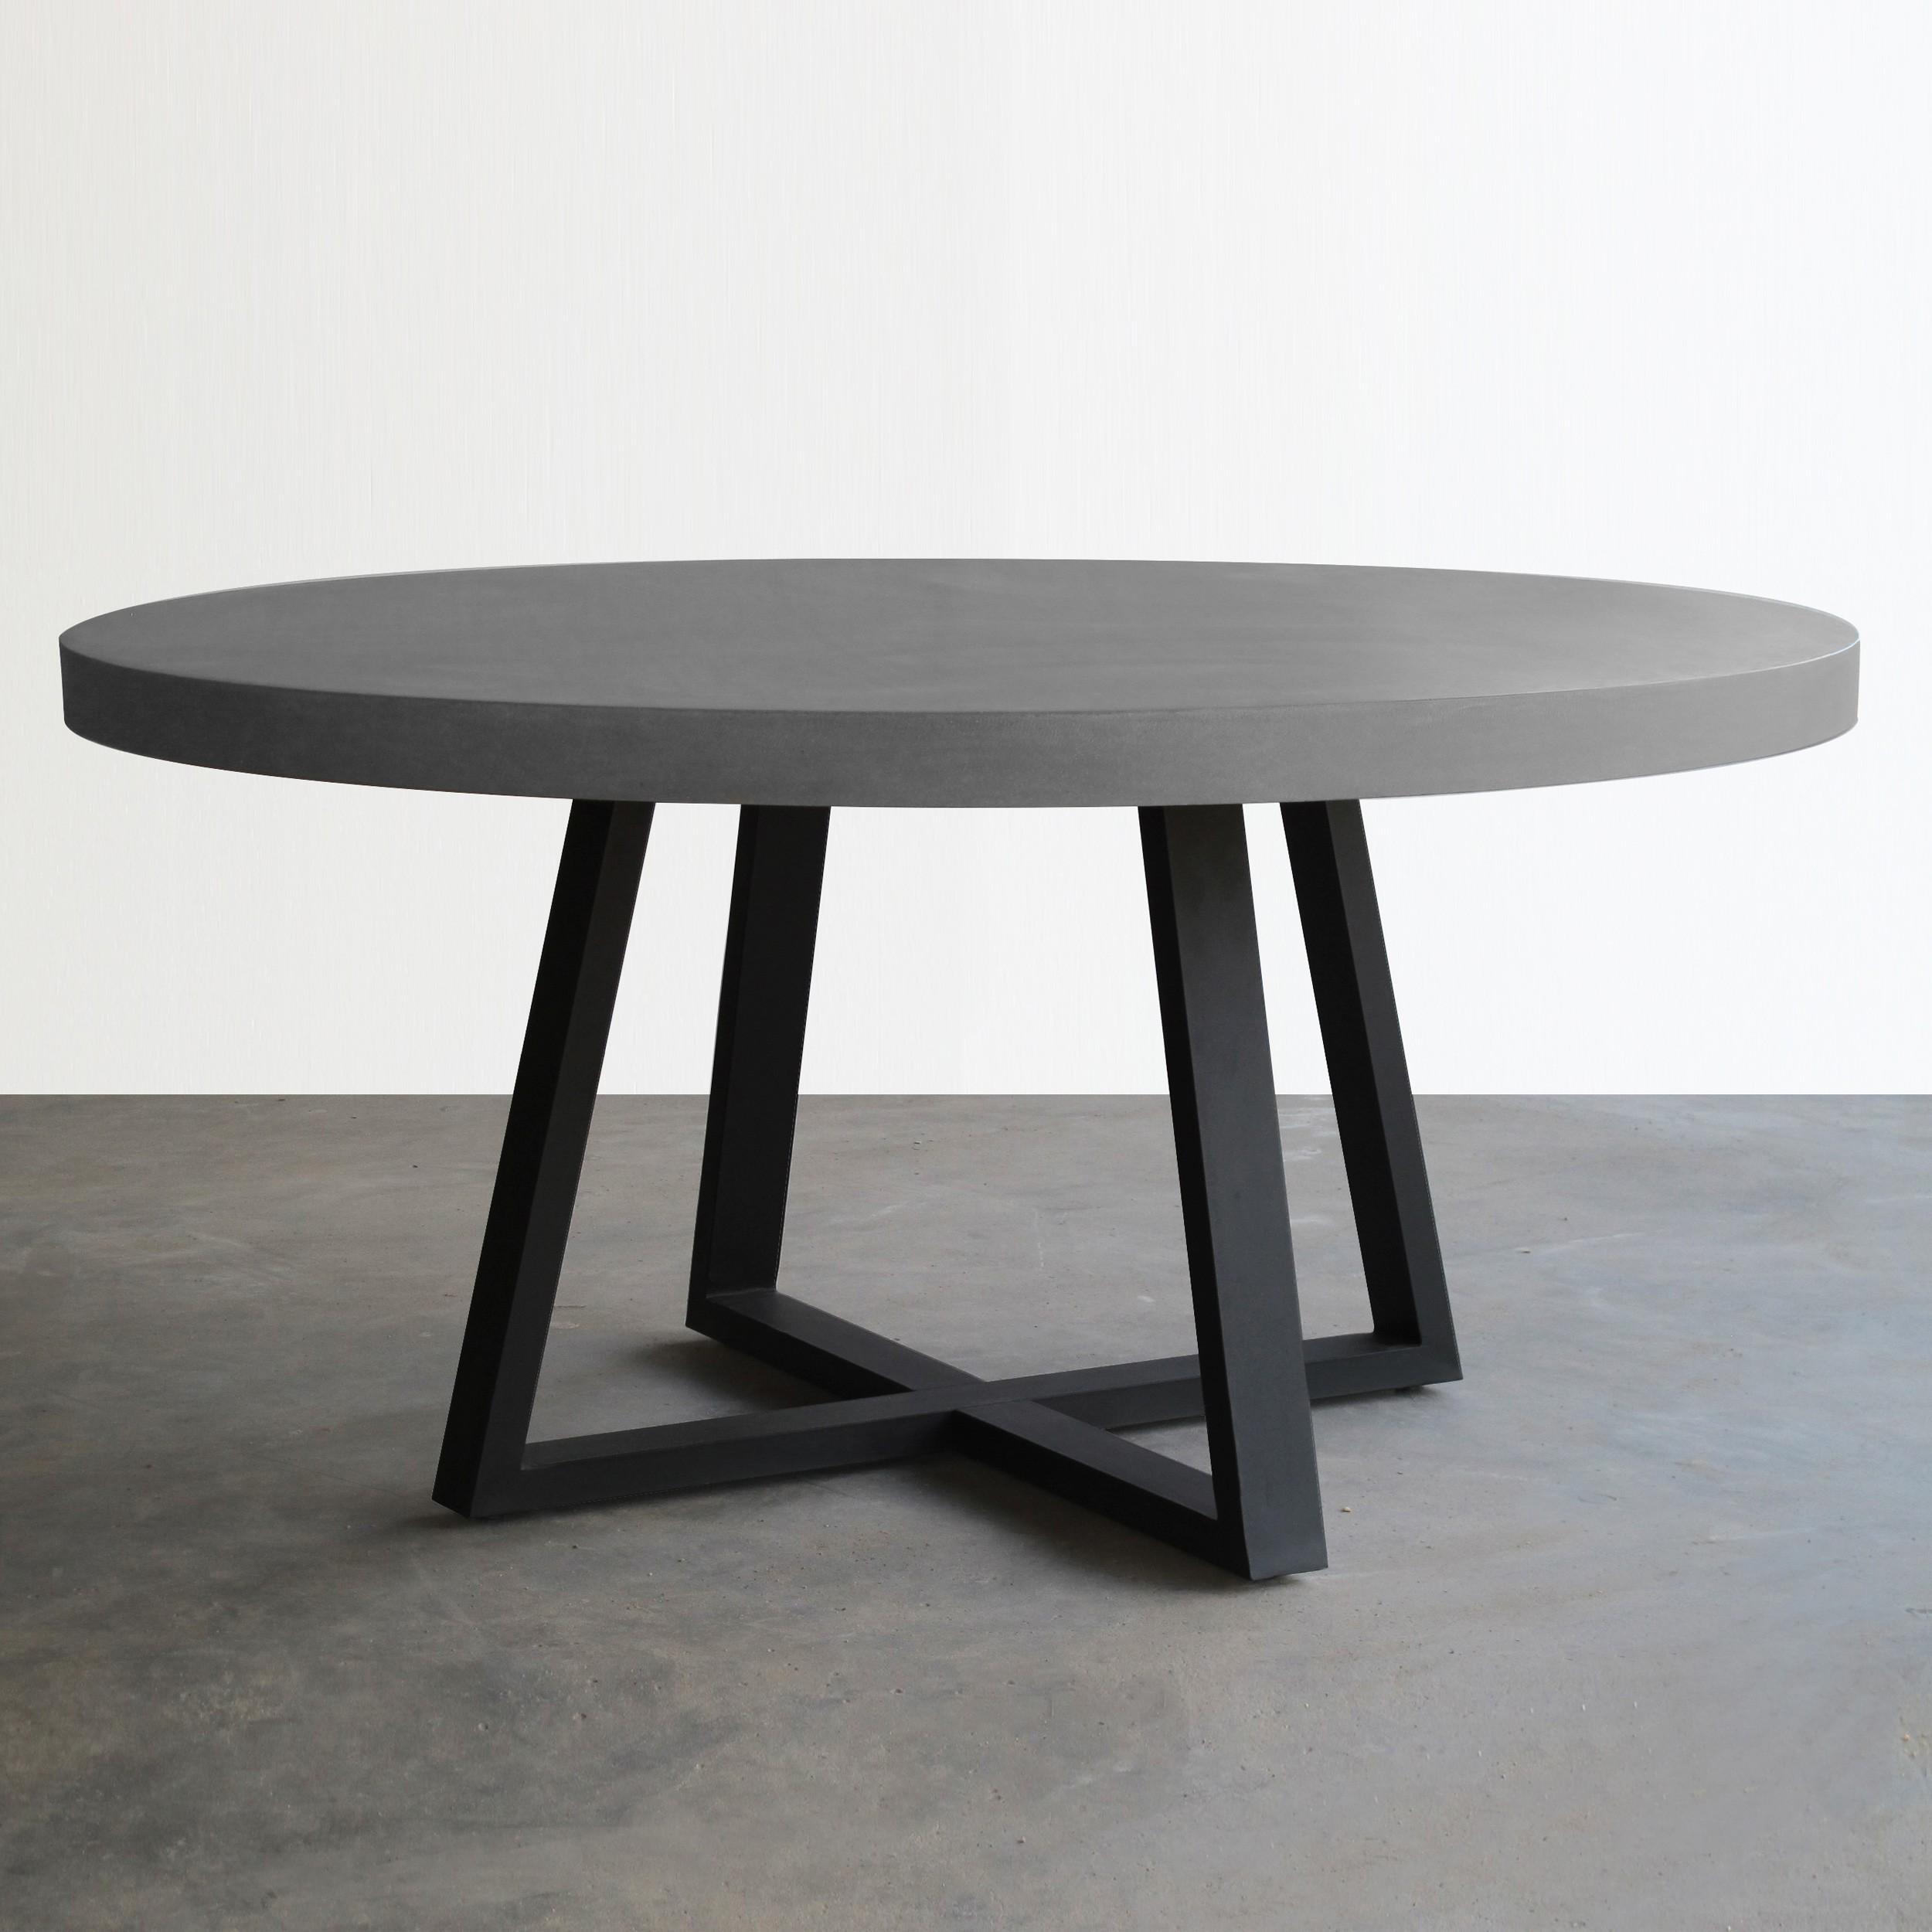 table ronde mahuru 140 cm d couvrez nos tables rondes mahuru 140 cm rdv d co. Black Bedroom Furniture Sets. Home Design Ideas